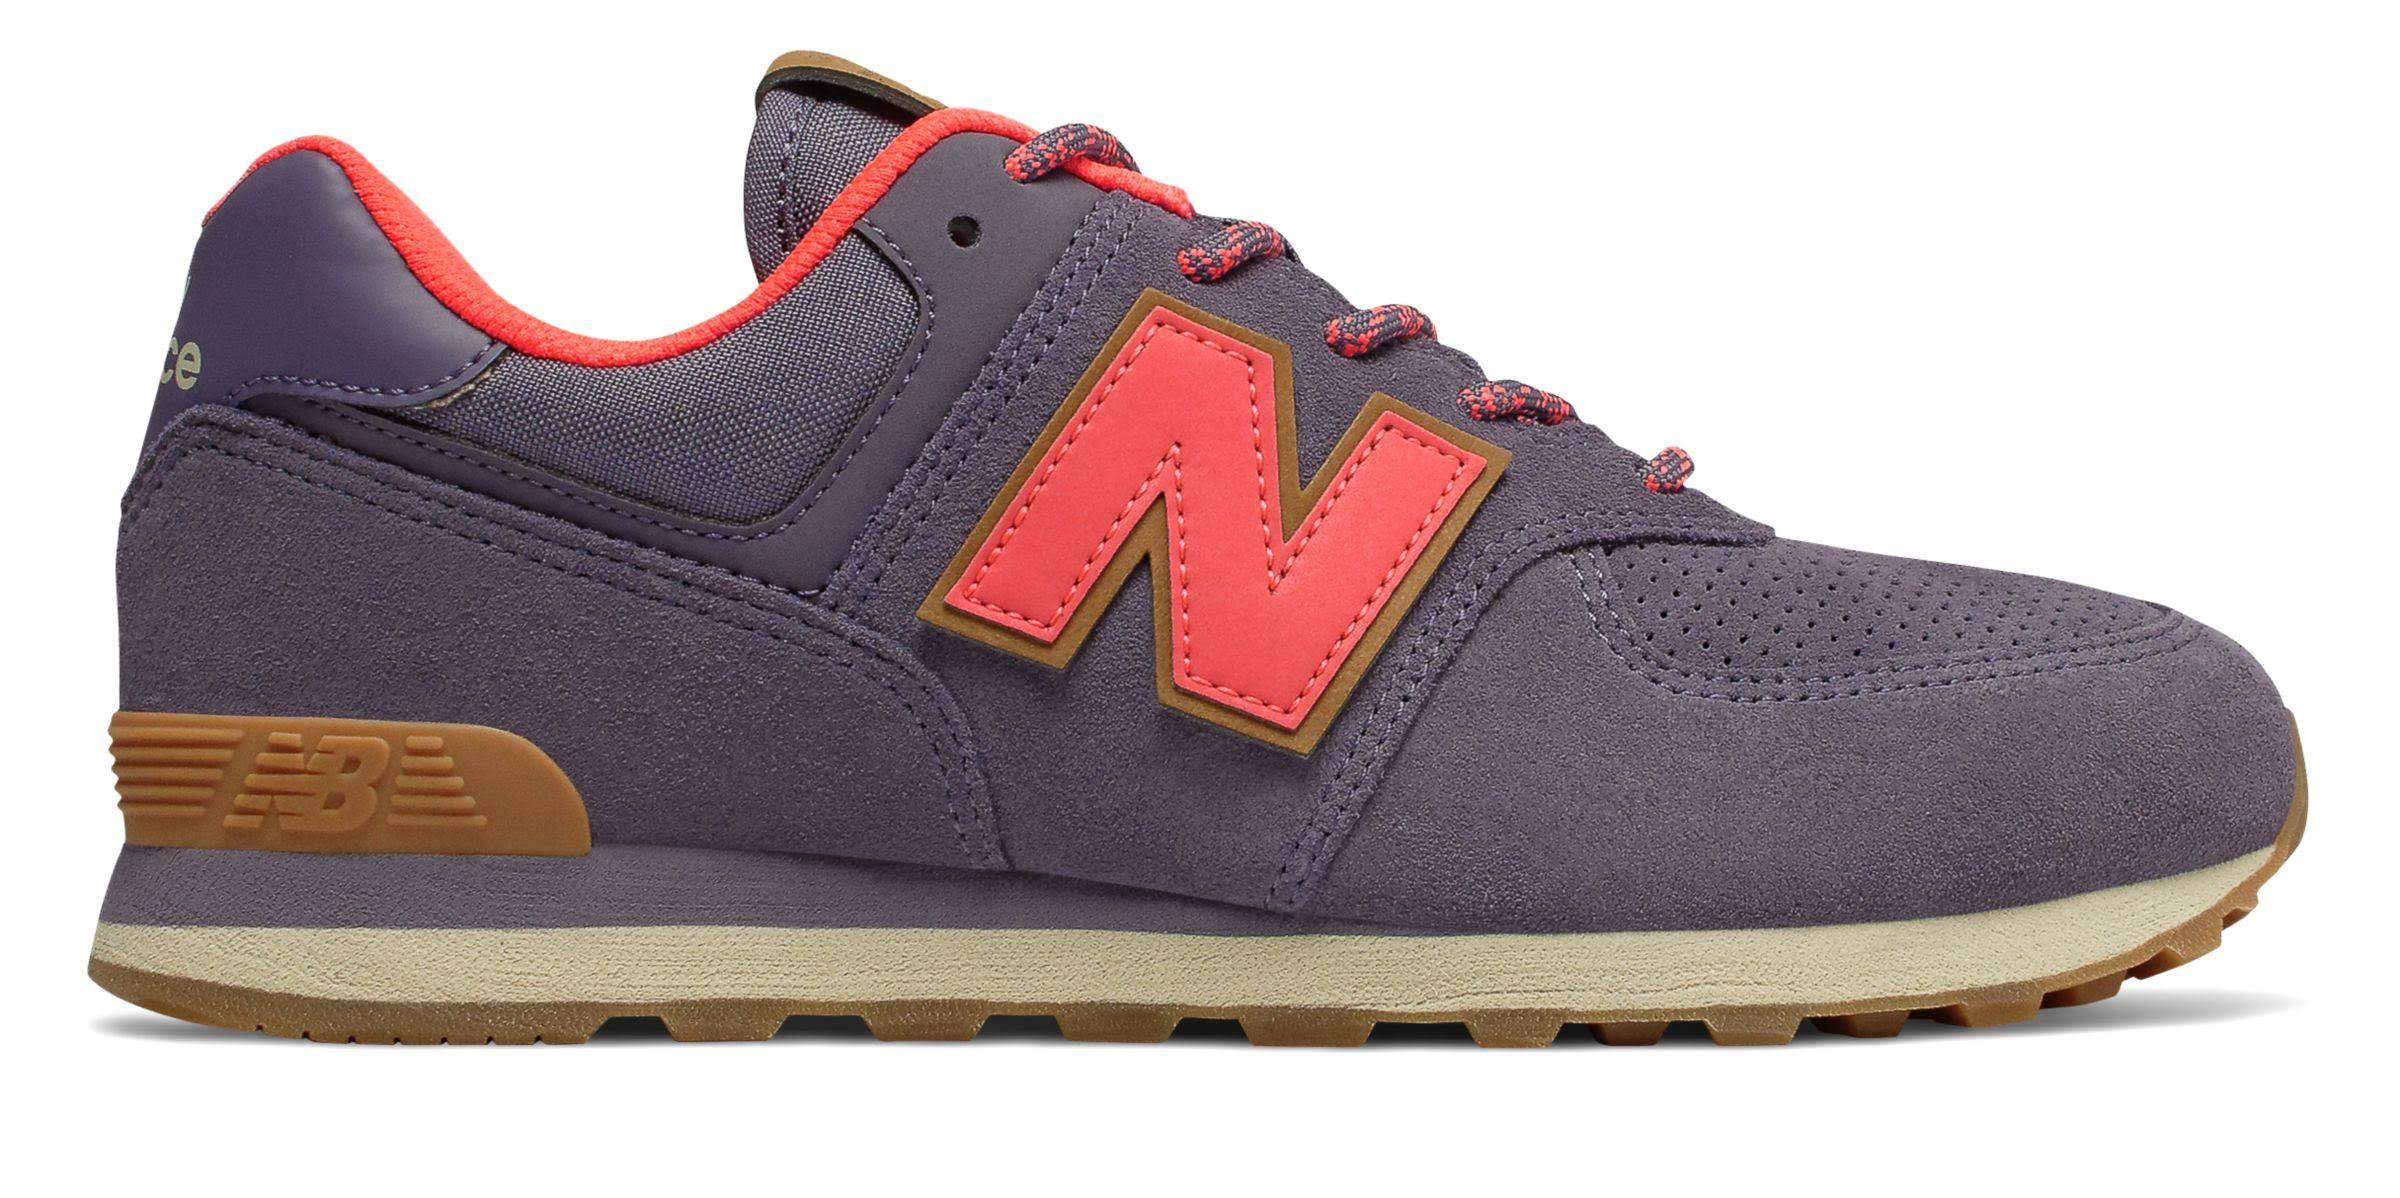 Zapatos Balance 5 Casuales Púrpura New 5 Tamaño Girls De 574 awd8RqIa